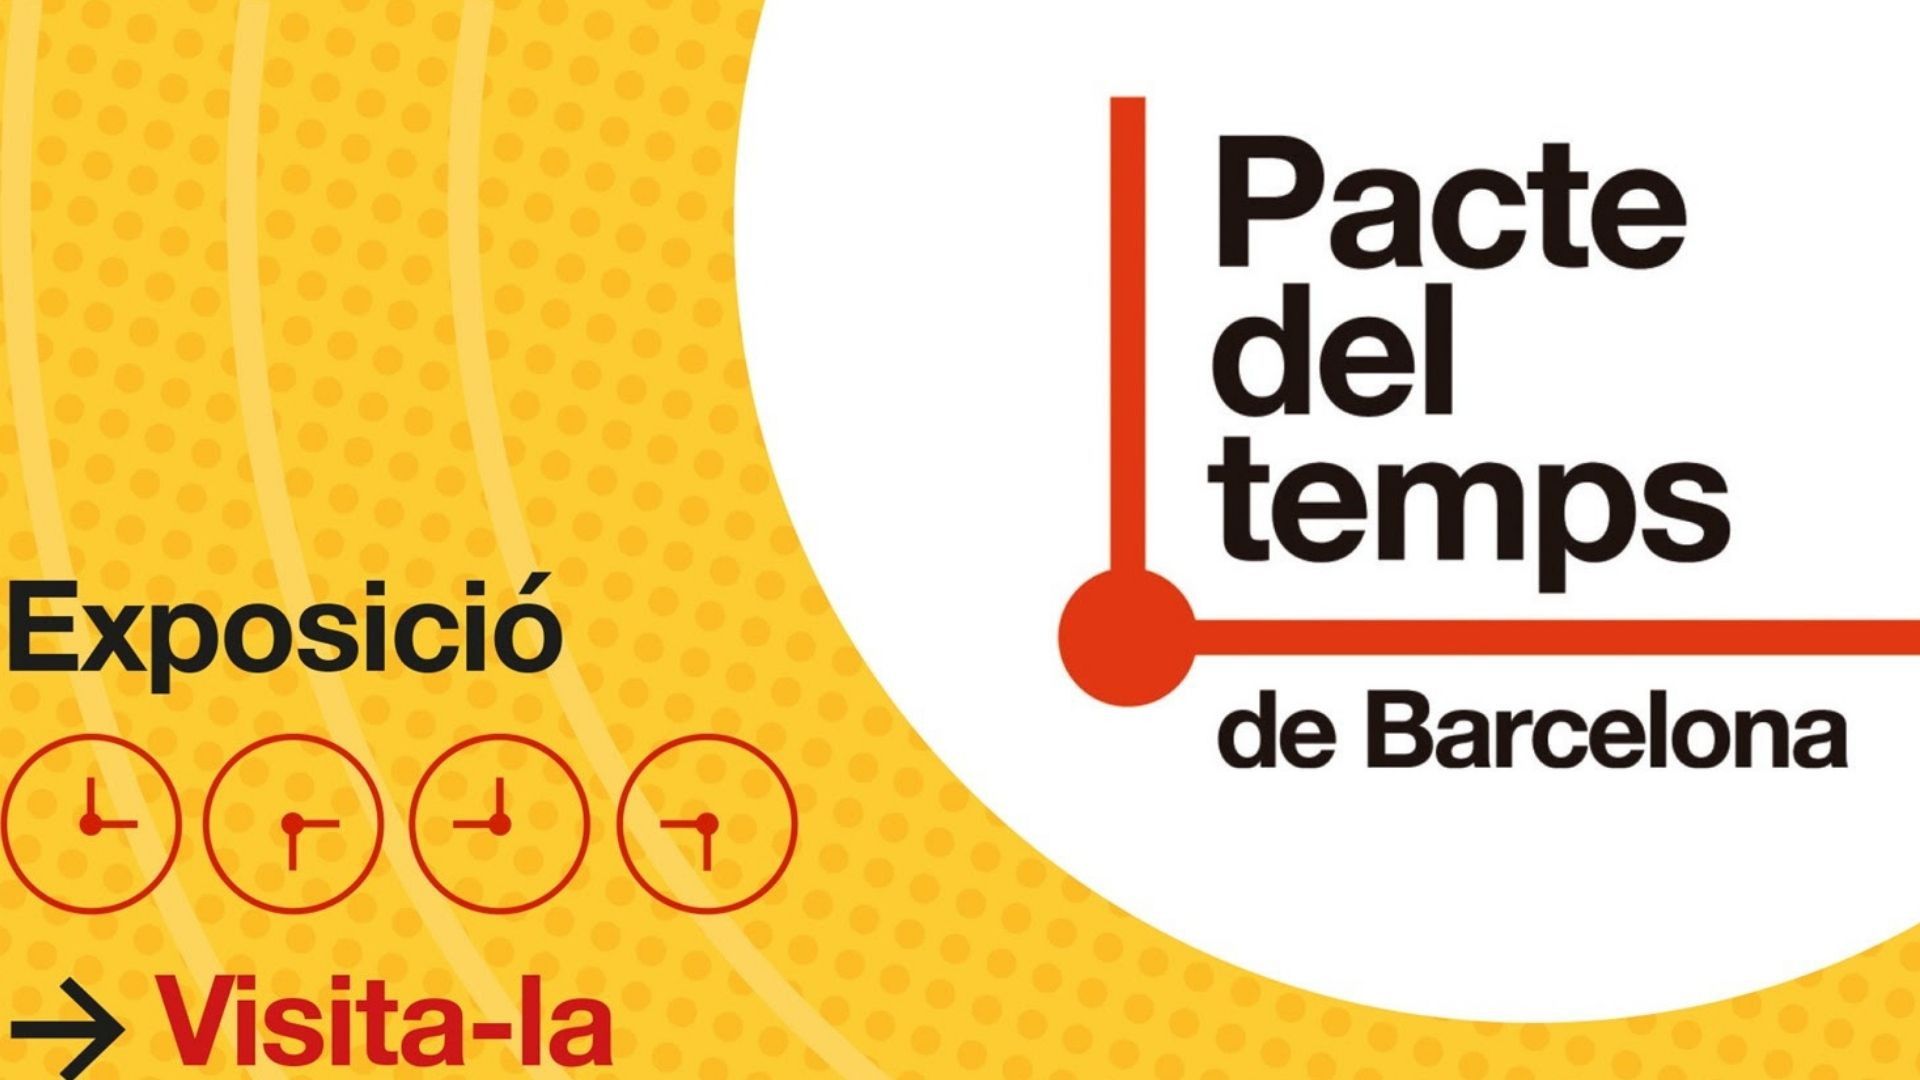 pacte del temps expo itiinerant